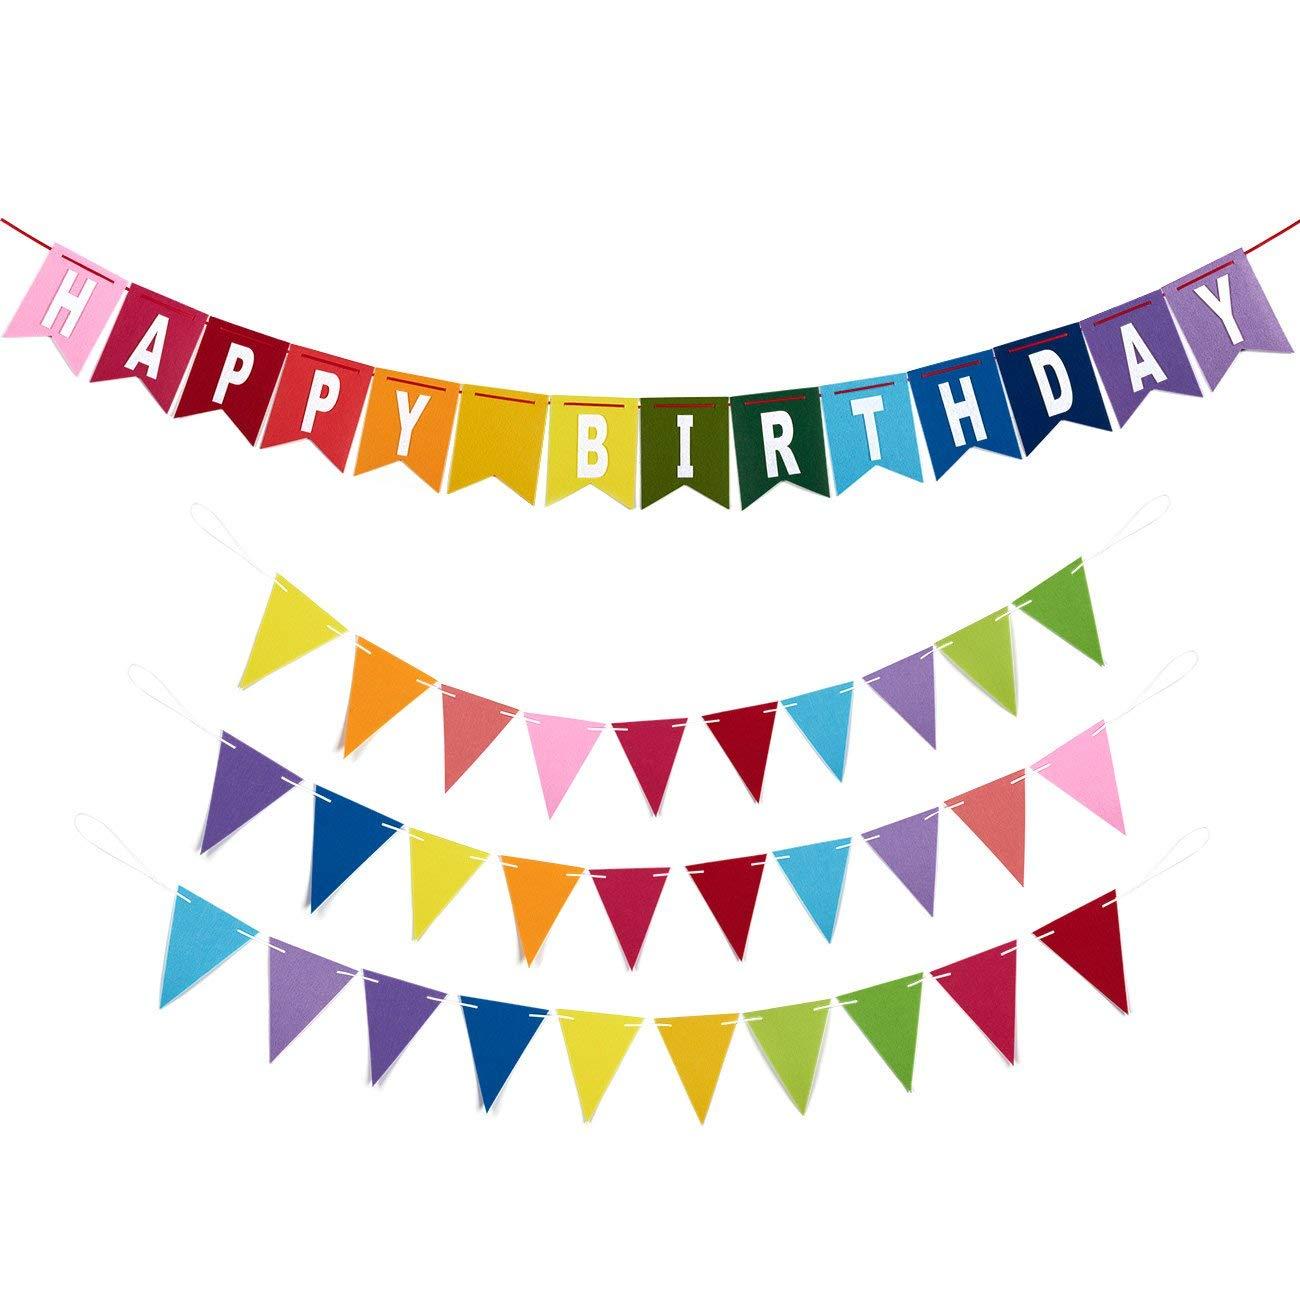 Blue Panda Happy Birthday Banners - 4-Piece Set - Includes 1 Felt Birthday Banner 3 Felt Pennant Banners - Suitable Boys, Girls, Adults - Rainbow Birthday Decoration